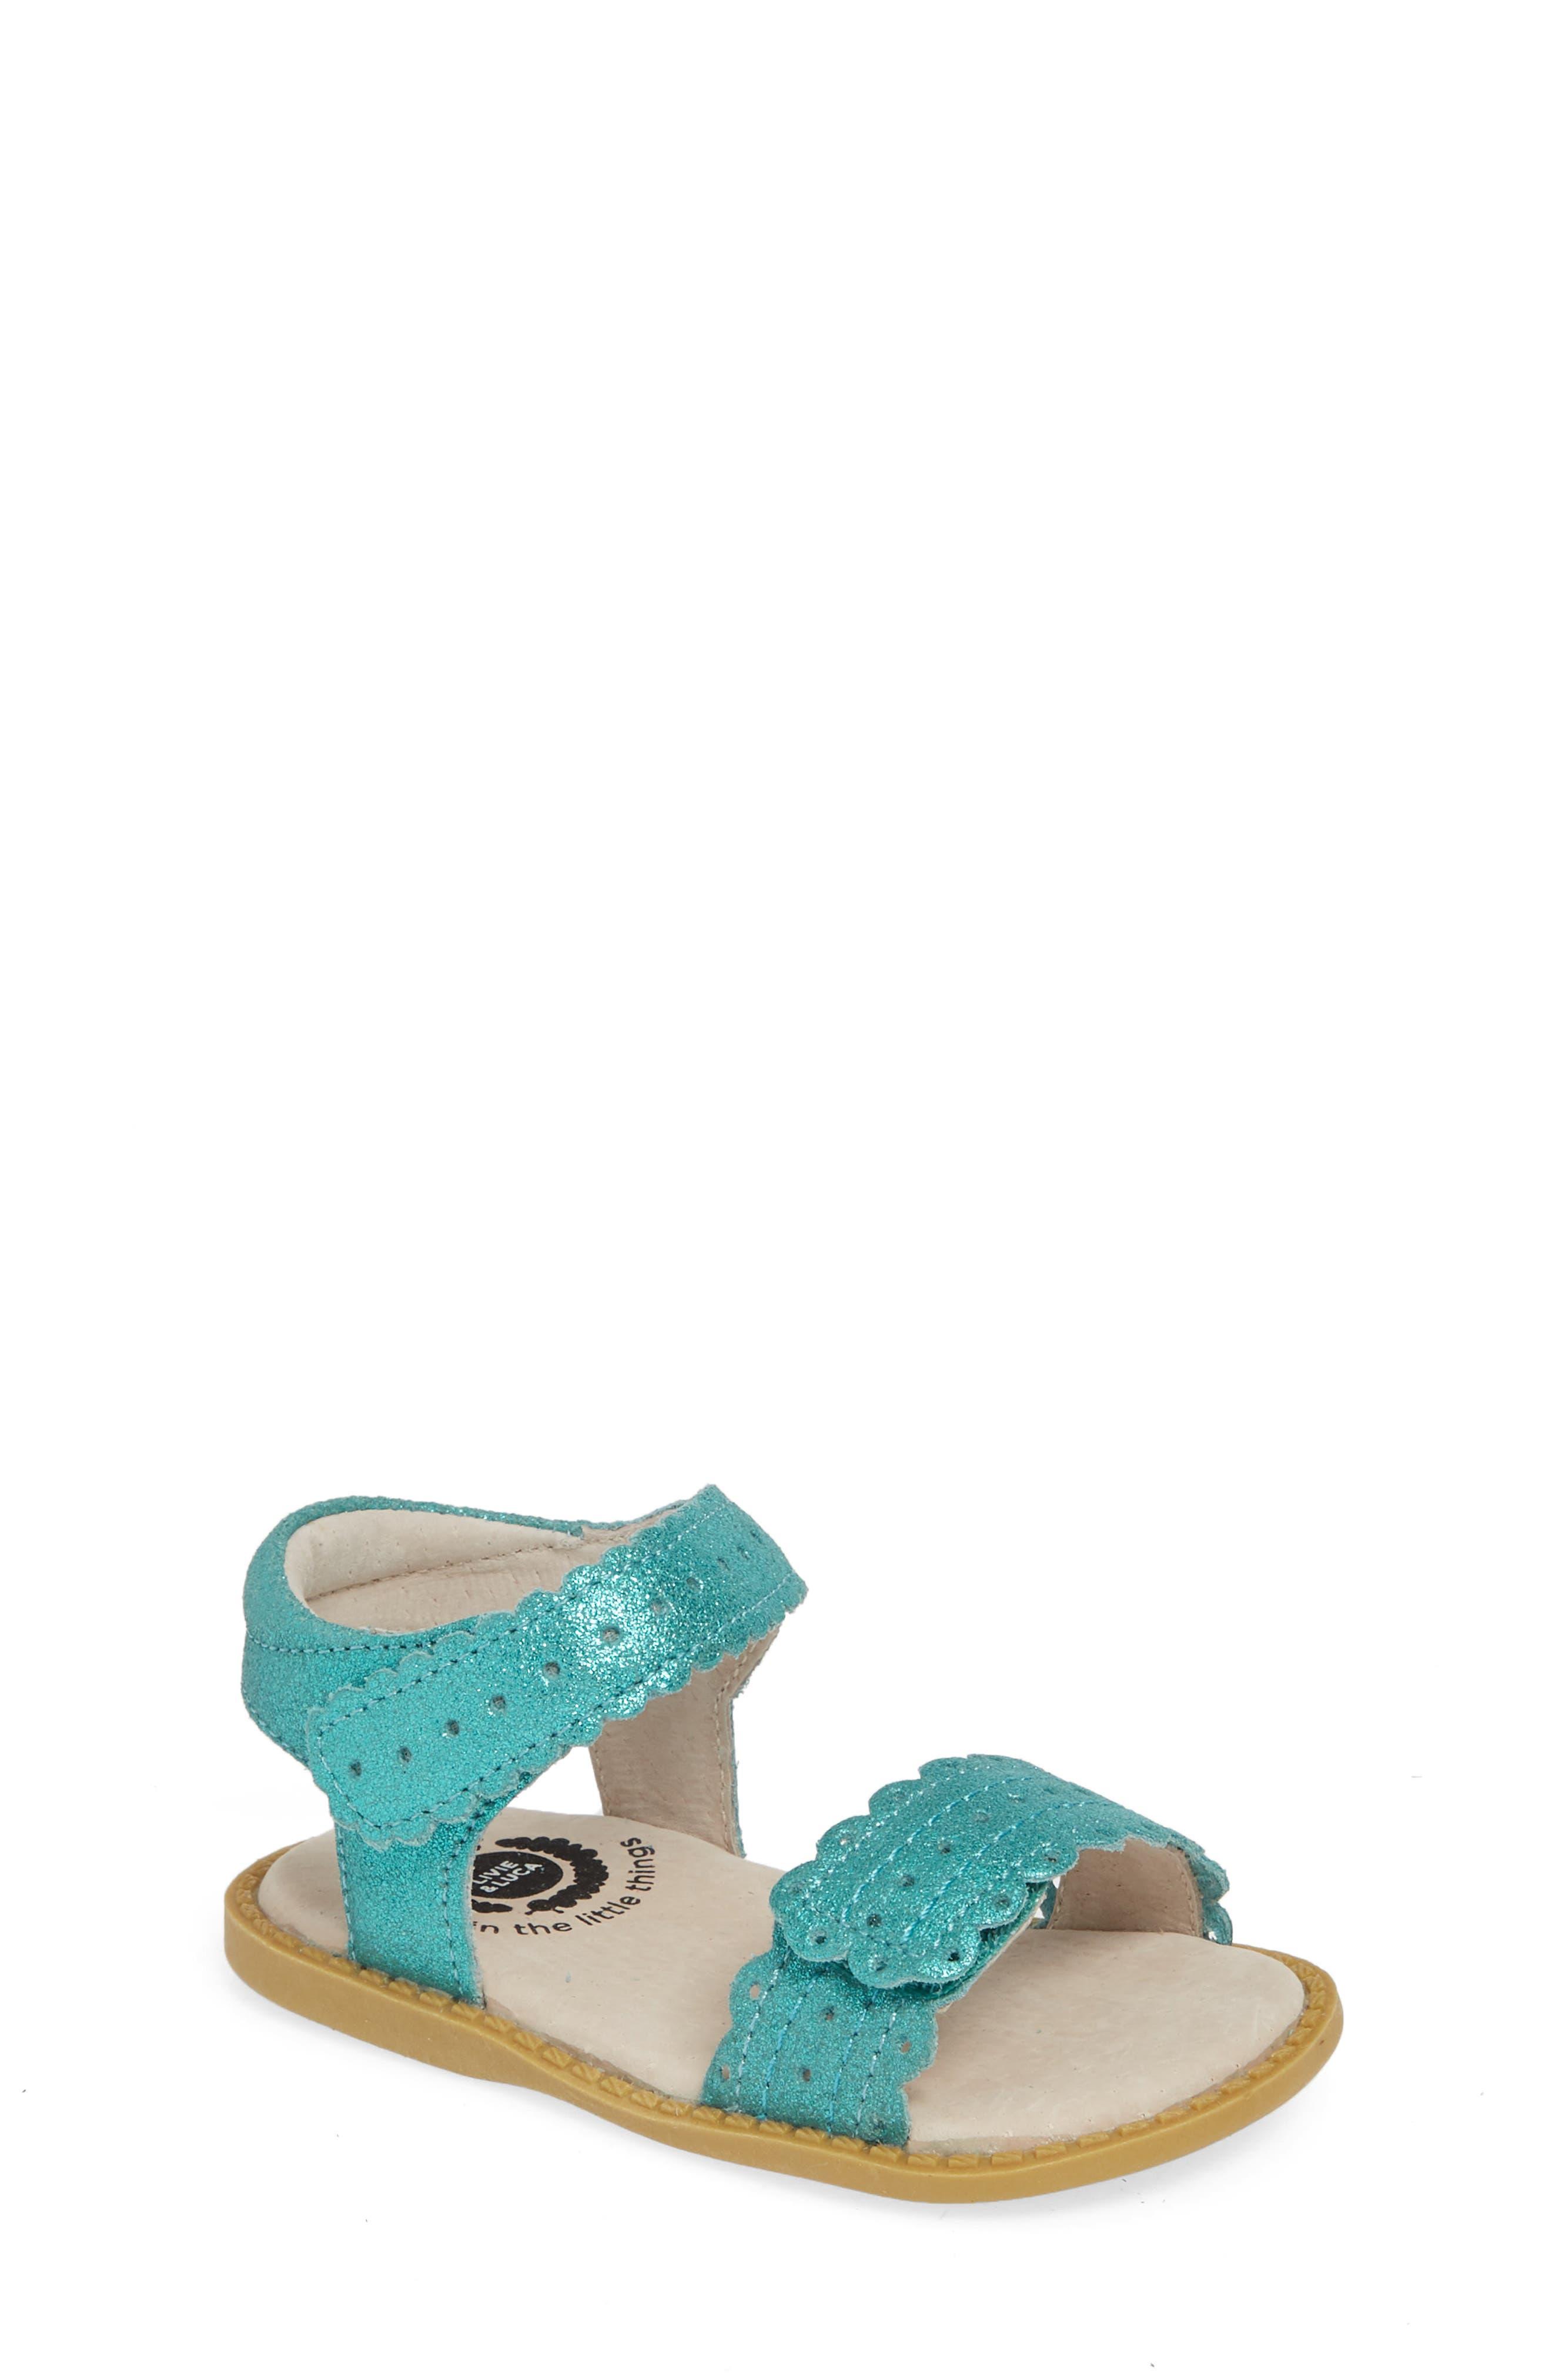 LIVIE & LUCA Posey Sandal, Main, color, AQUA SHIMMER